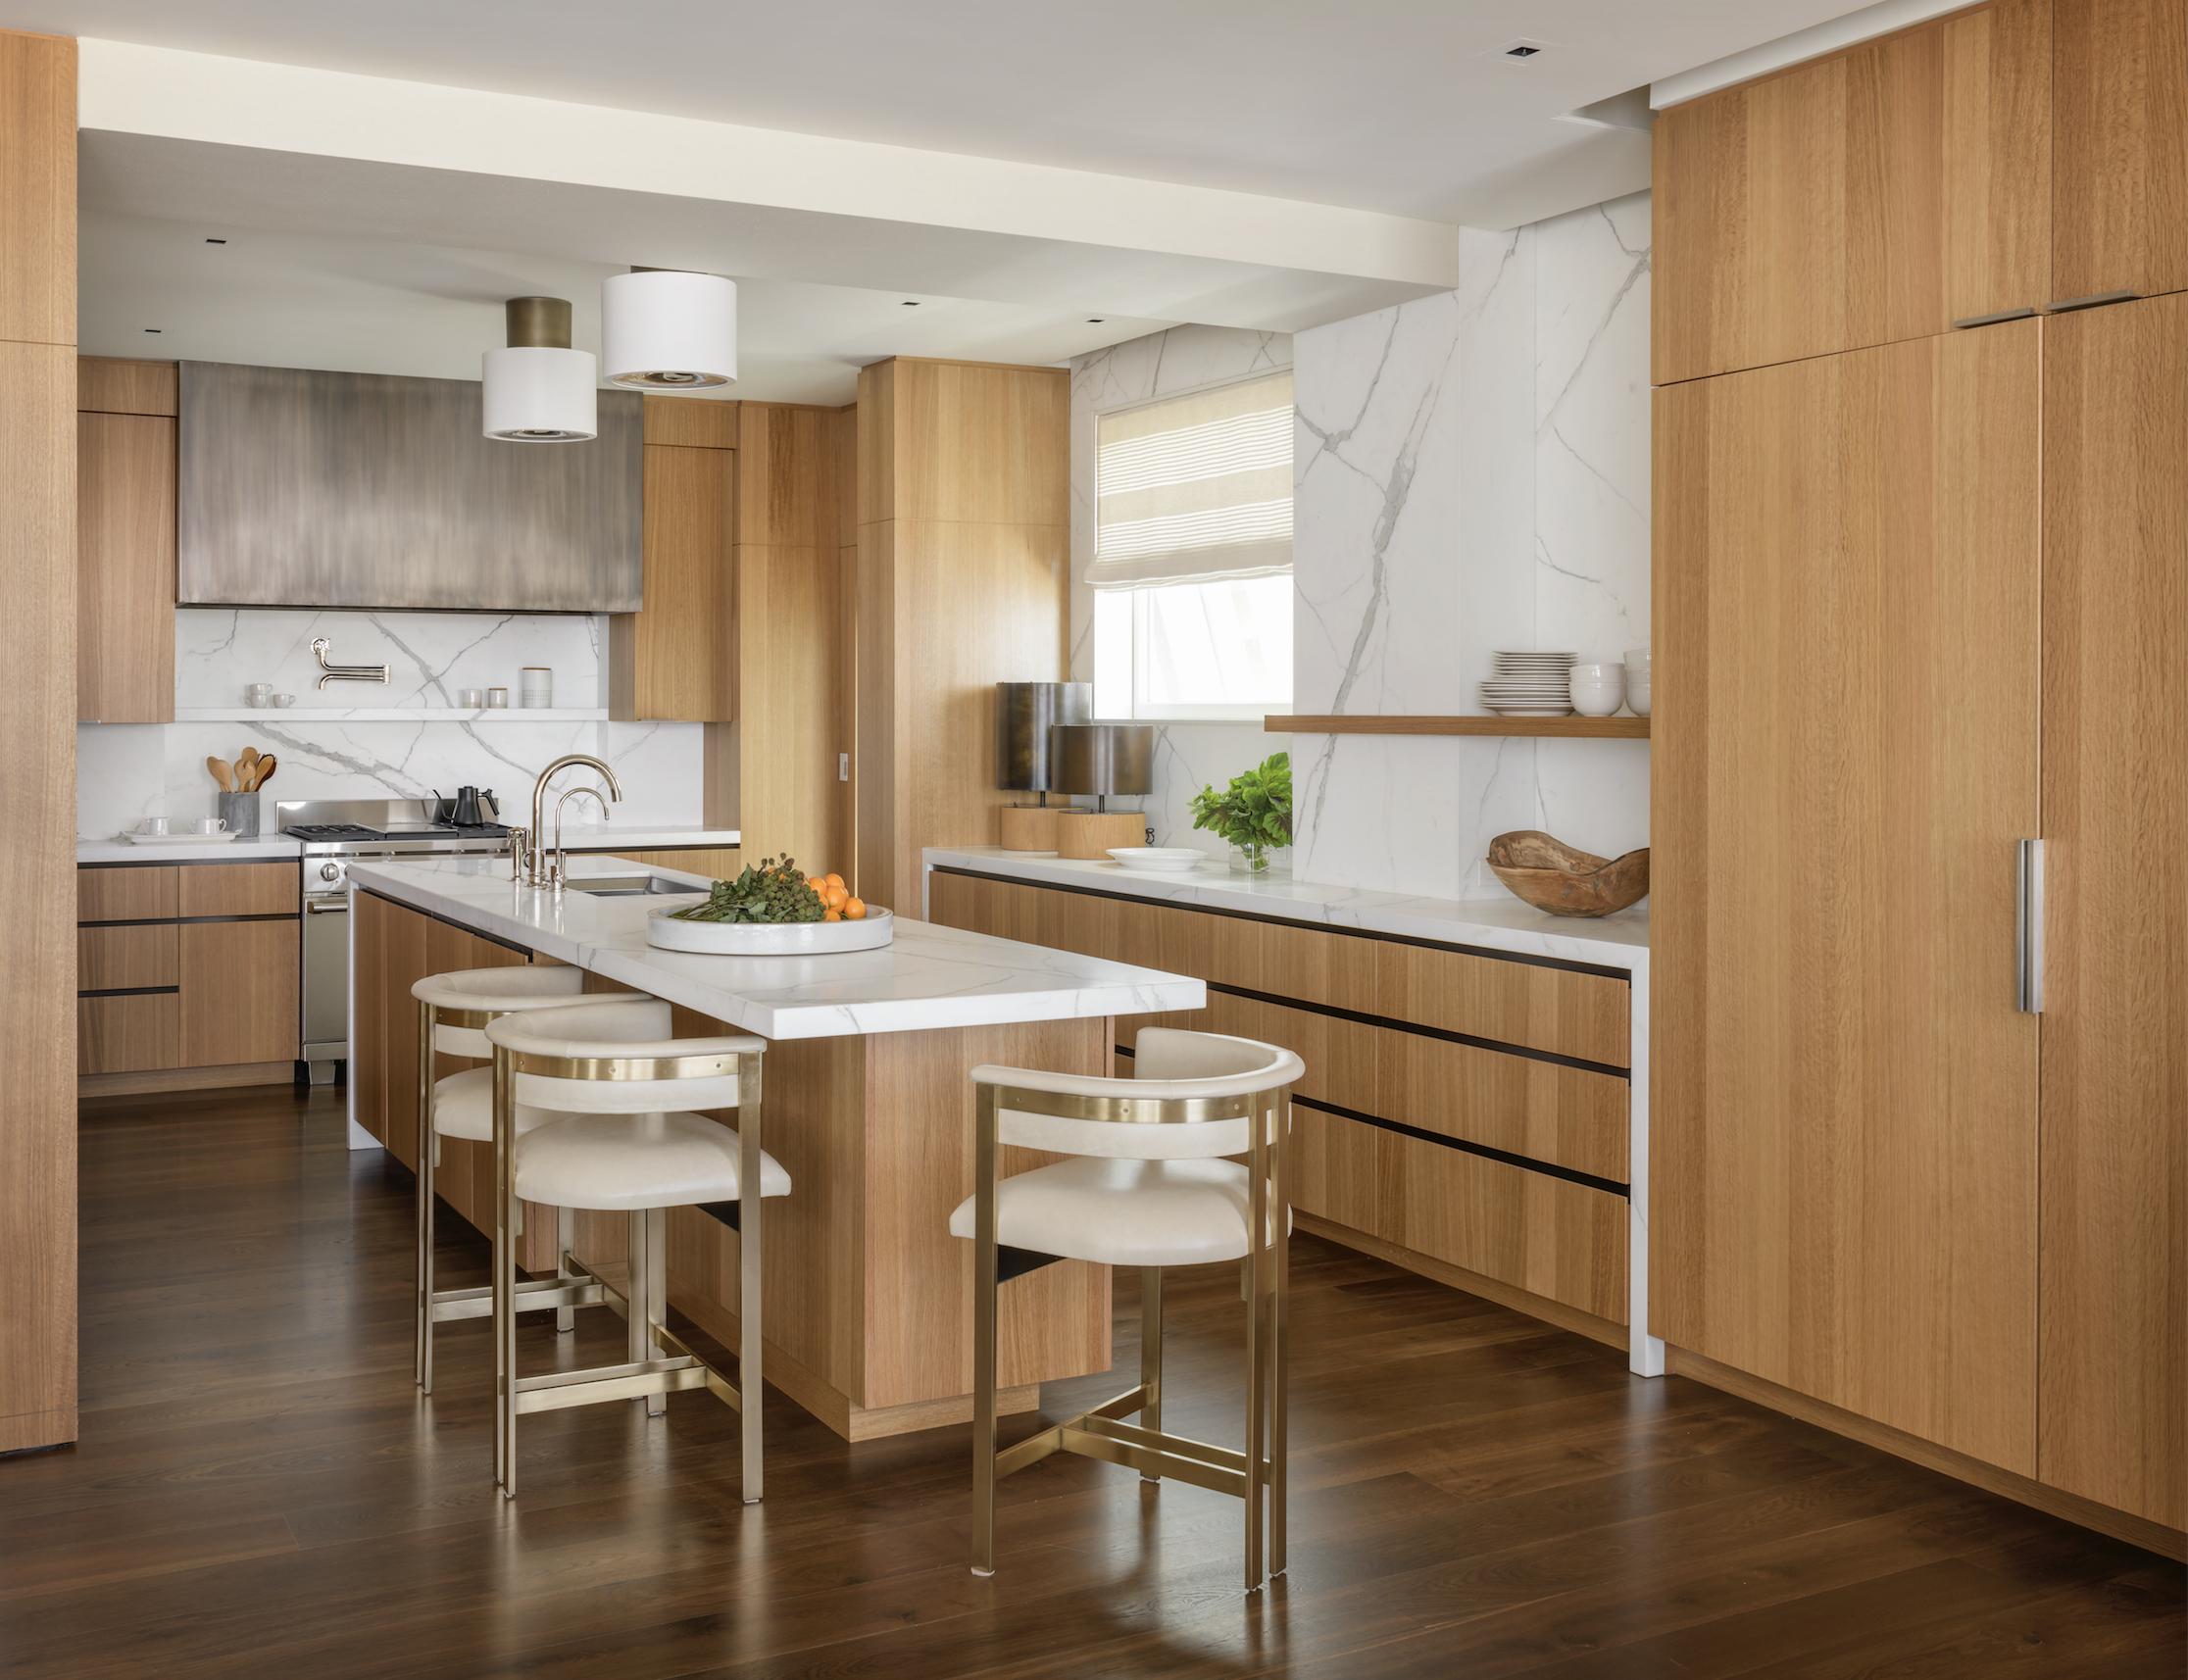 New kitchen trends in 2020